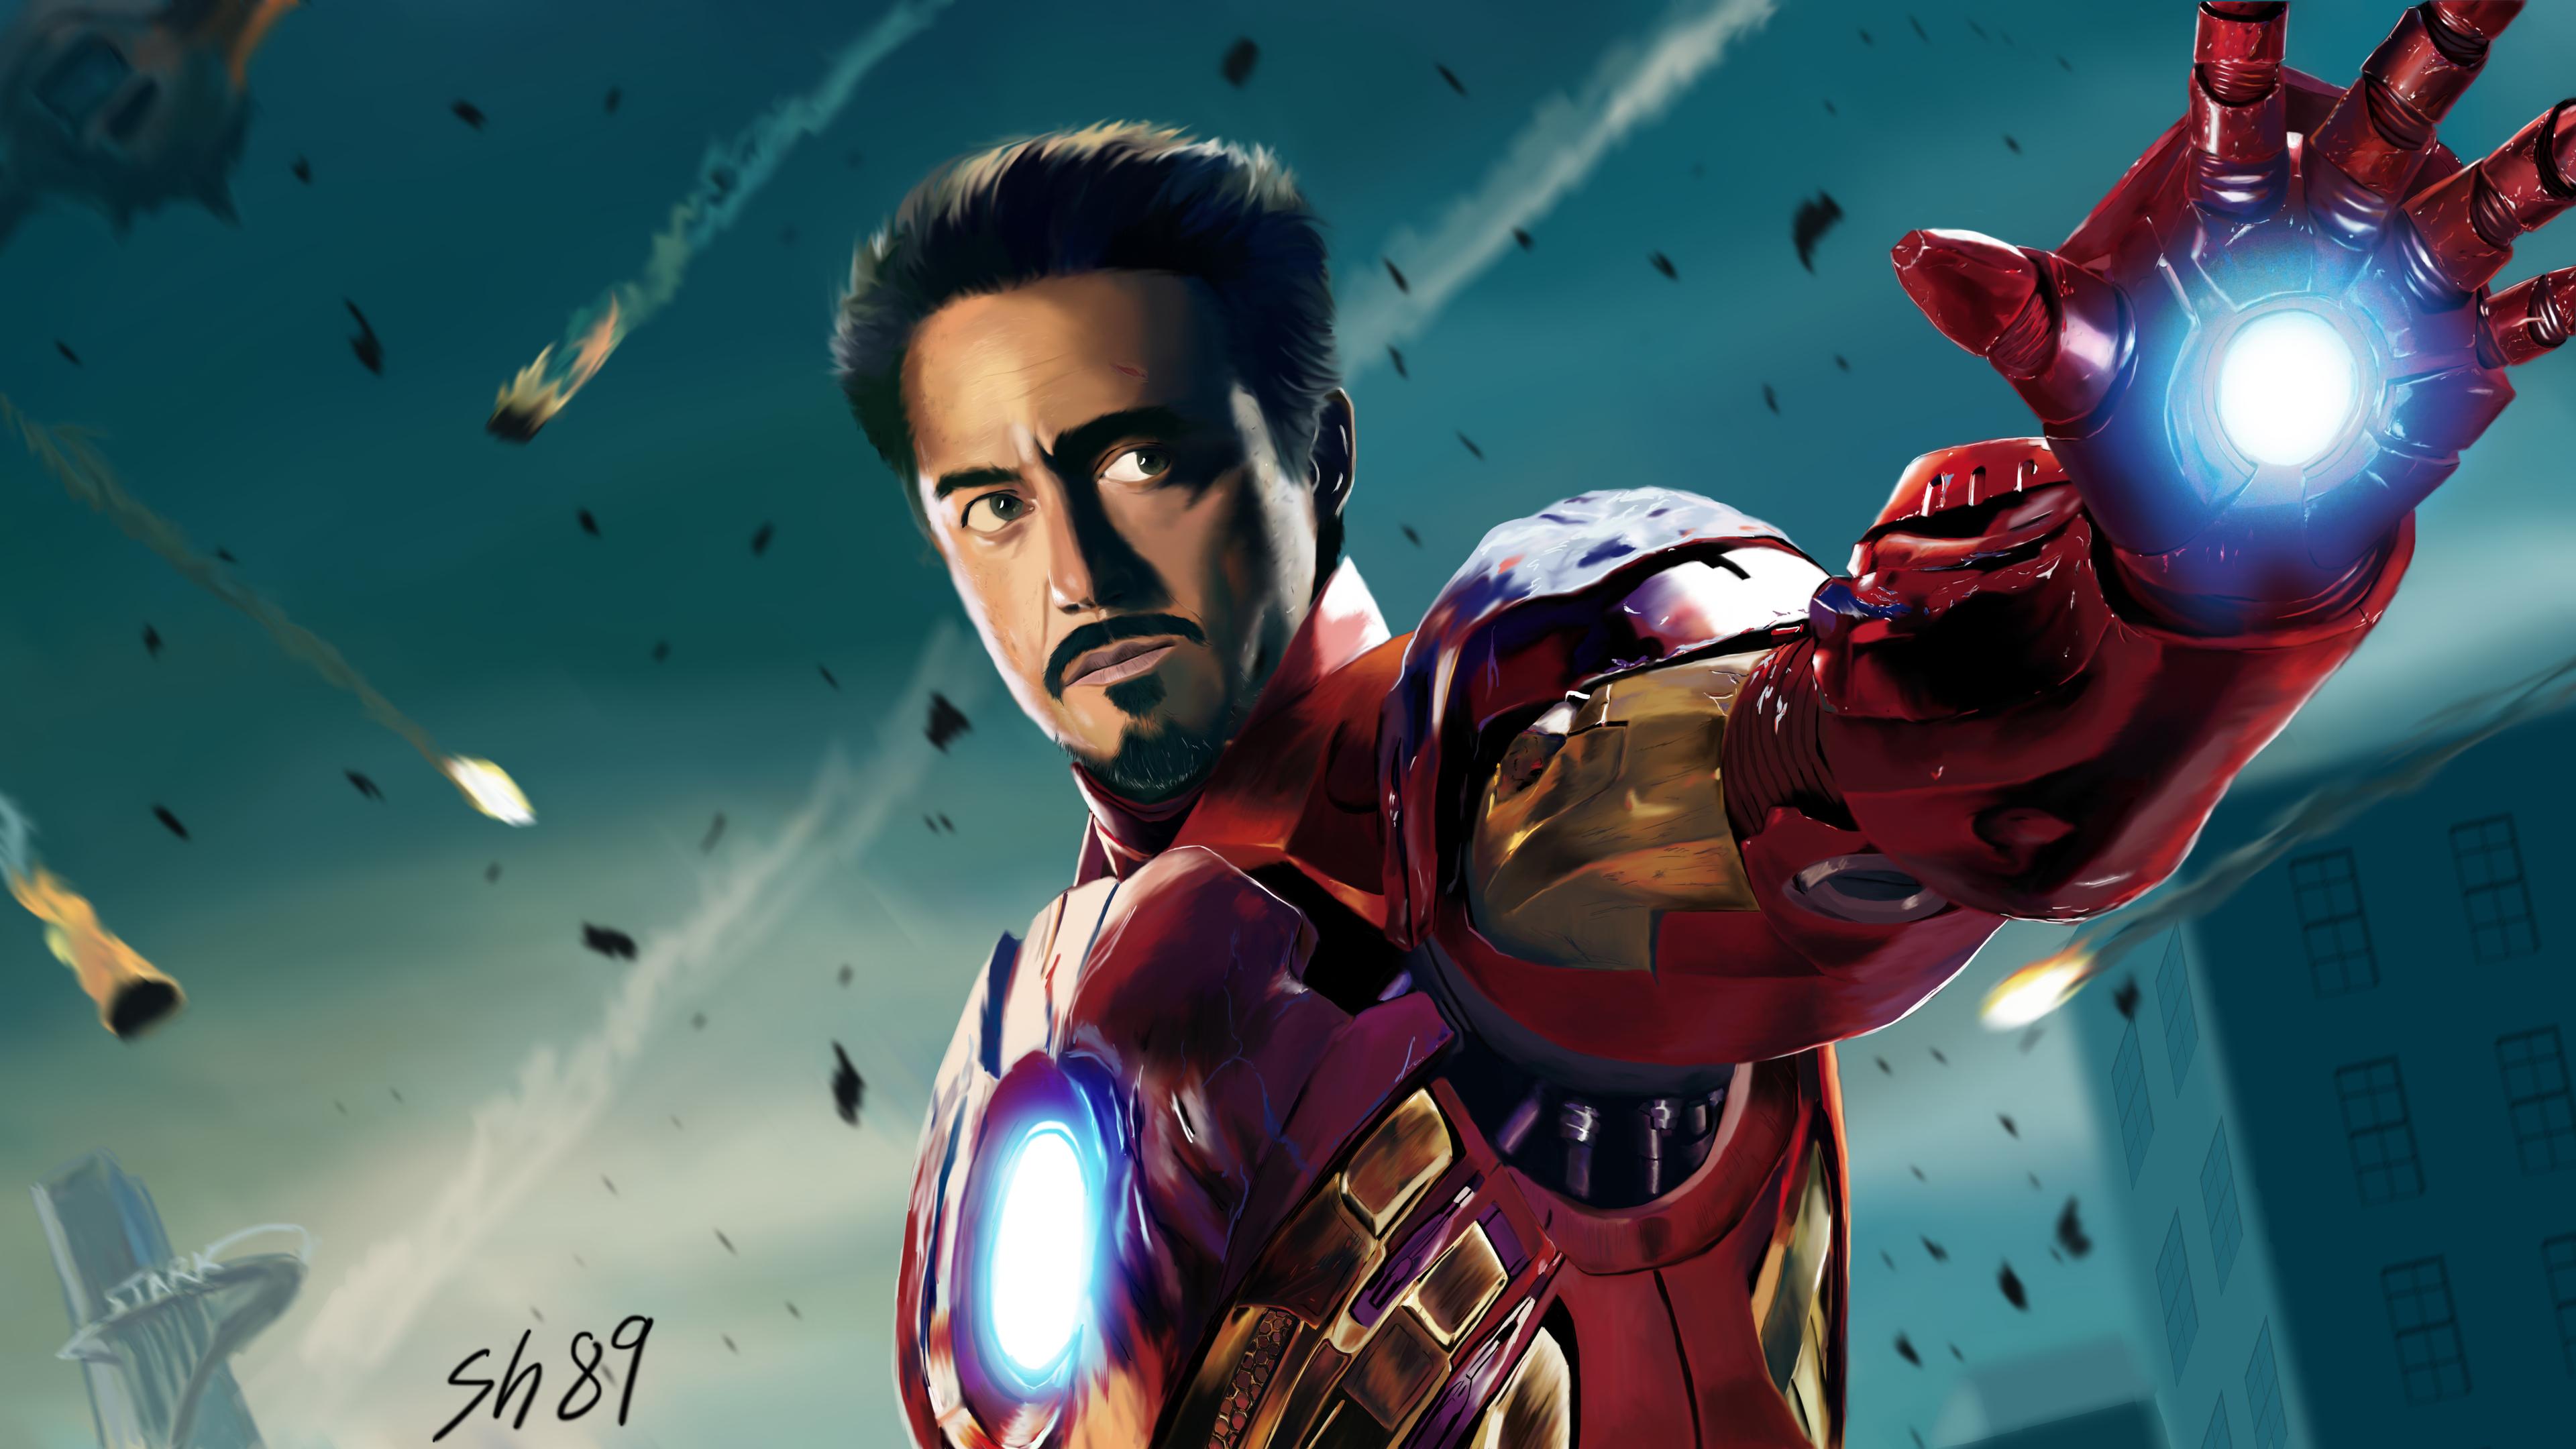 iron man avengers 4k 1544286770 - Iron Man Avengers 4k - superheroes wallpapers, iron man wallpapers, hd-wallpapers, deviantart wallpapers, artwork wallpapers, artist wallpapers, 4k-wallpapers